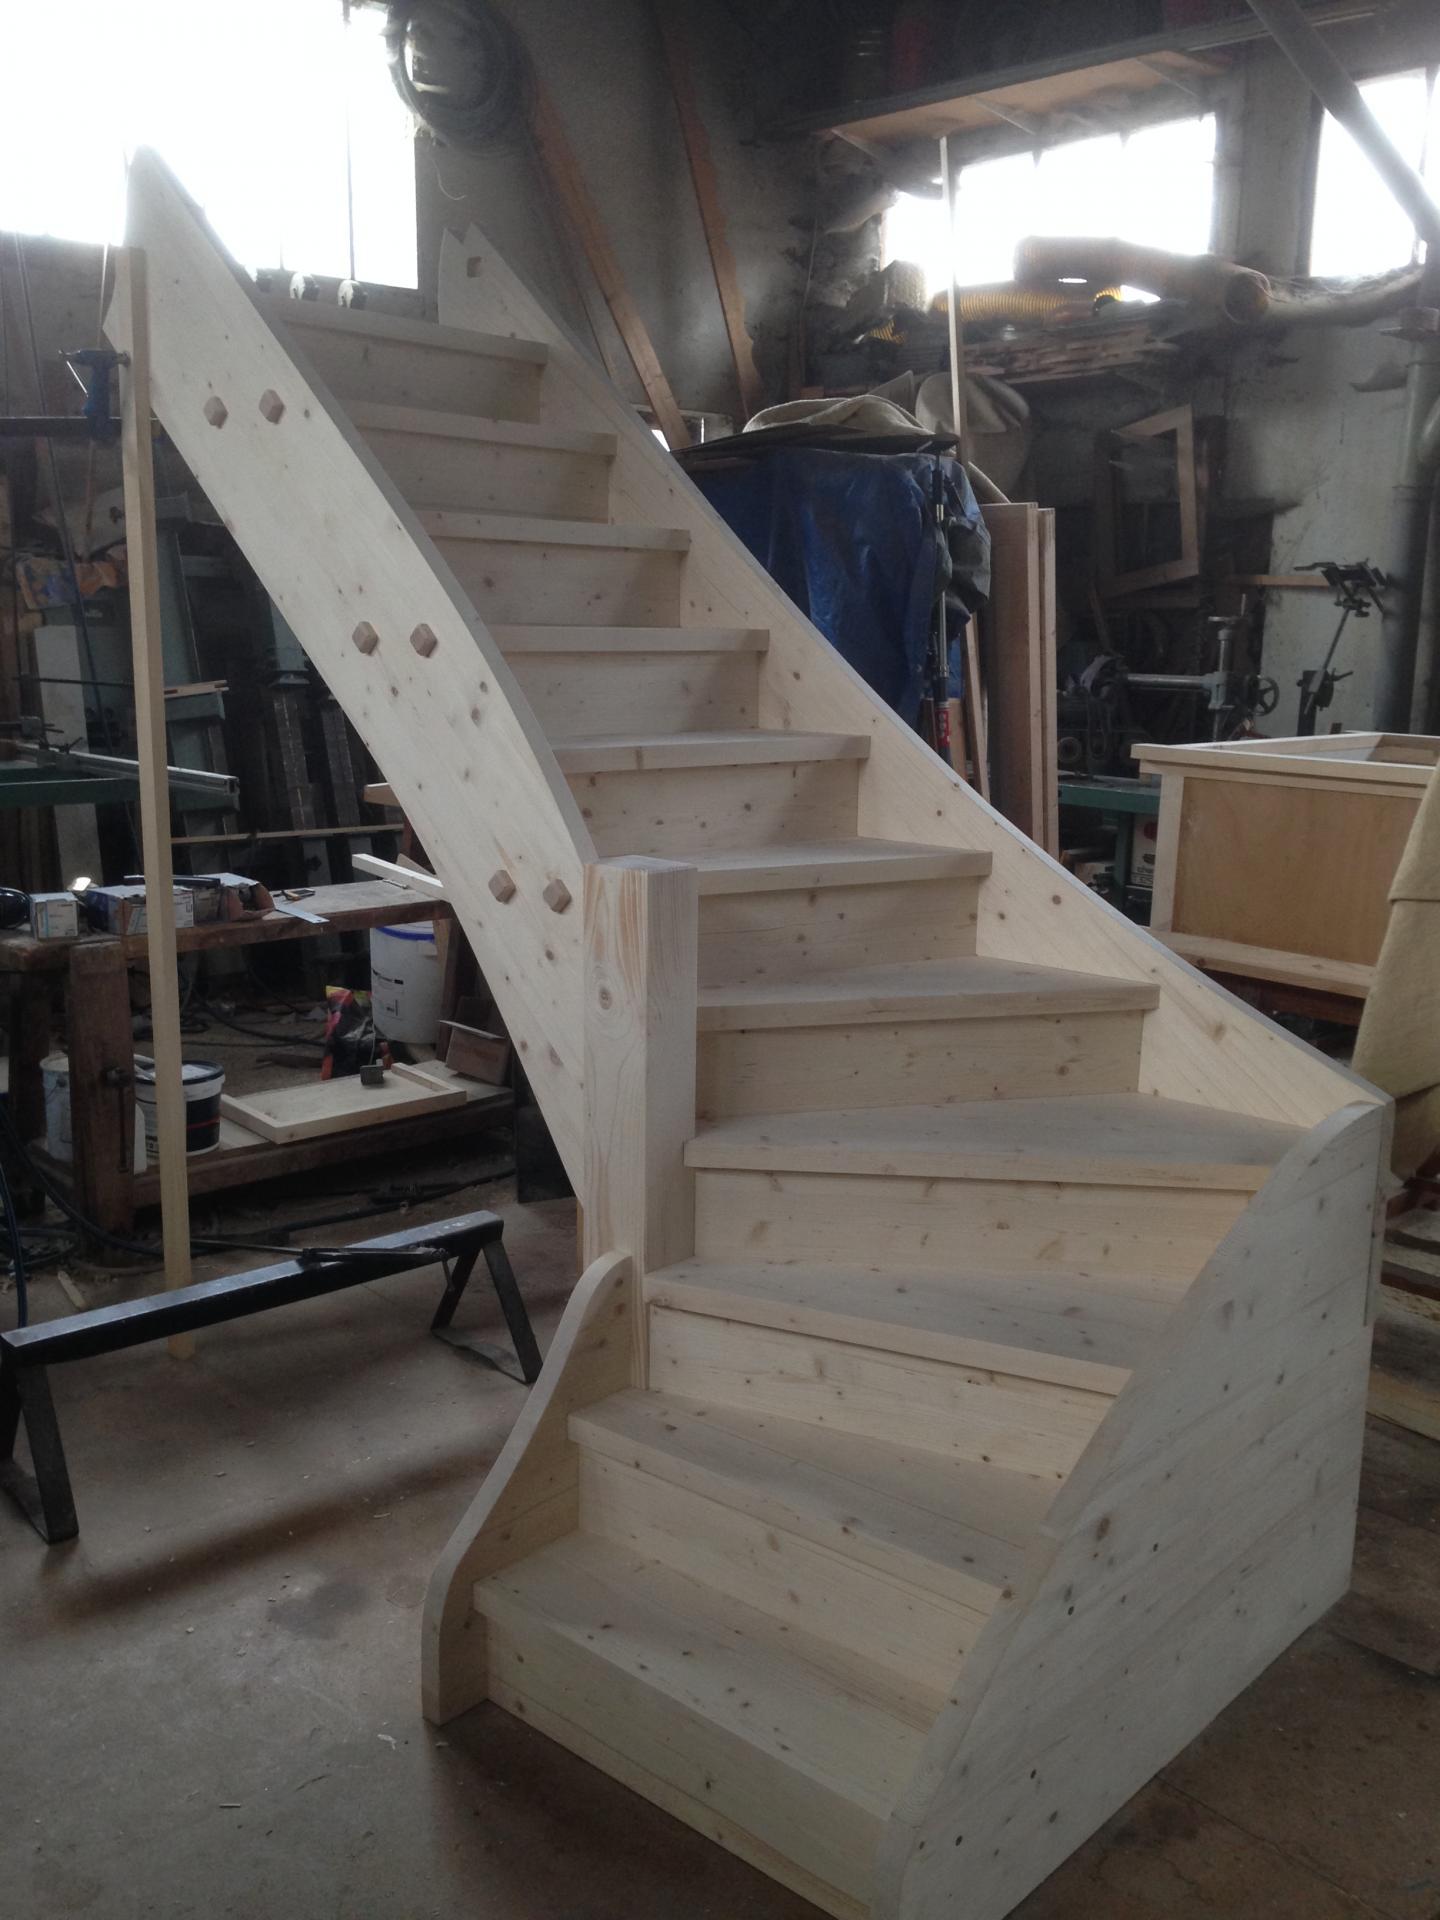 escalier sapin avec marches amovibles. Black Bedroom Furniture Sets. Home Design Ideas